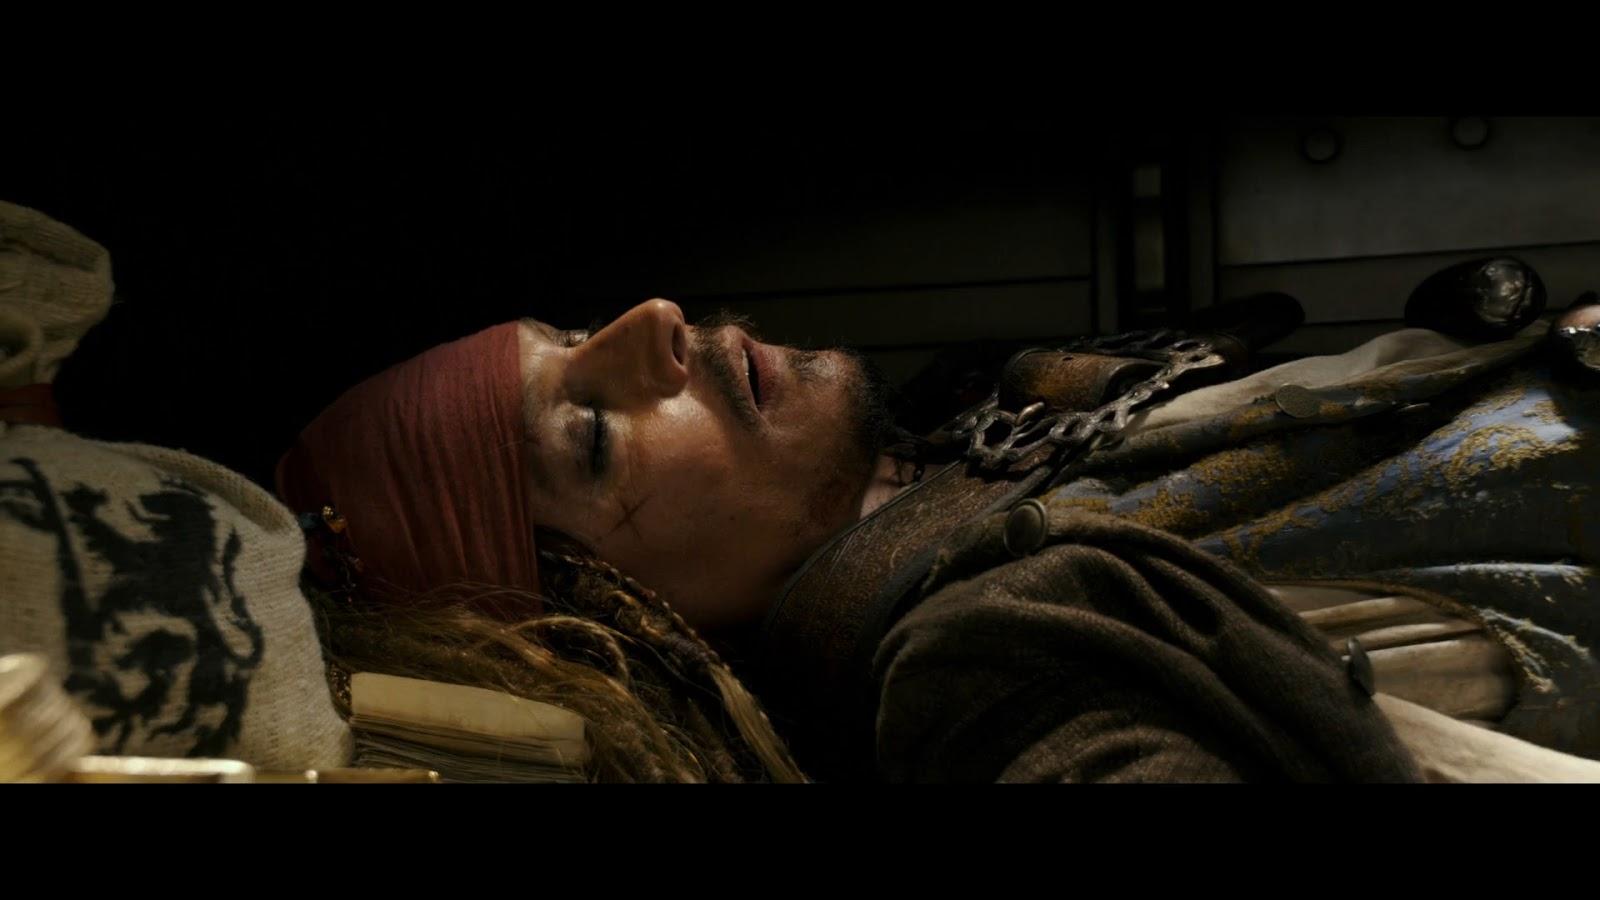 Piratas del Caribe 5: La venganza de Salazar (2017) Full HD 1080p Español Latino - Castellano - Ingles Captura 2